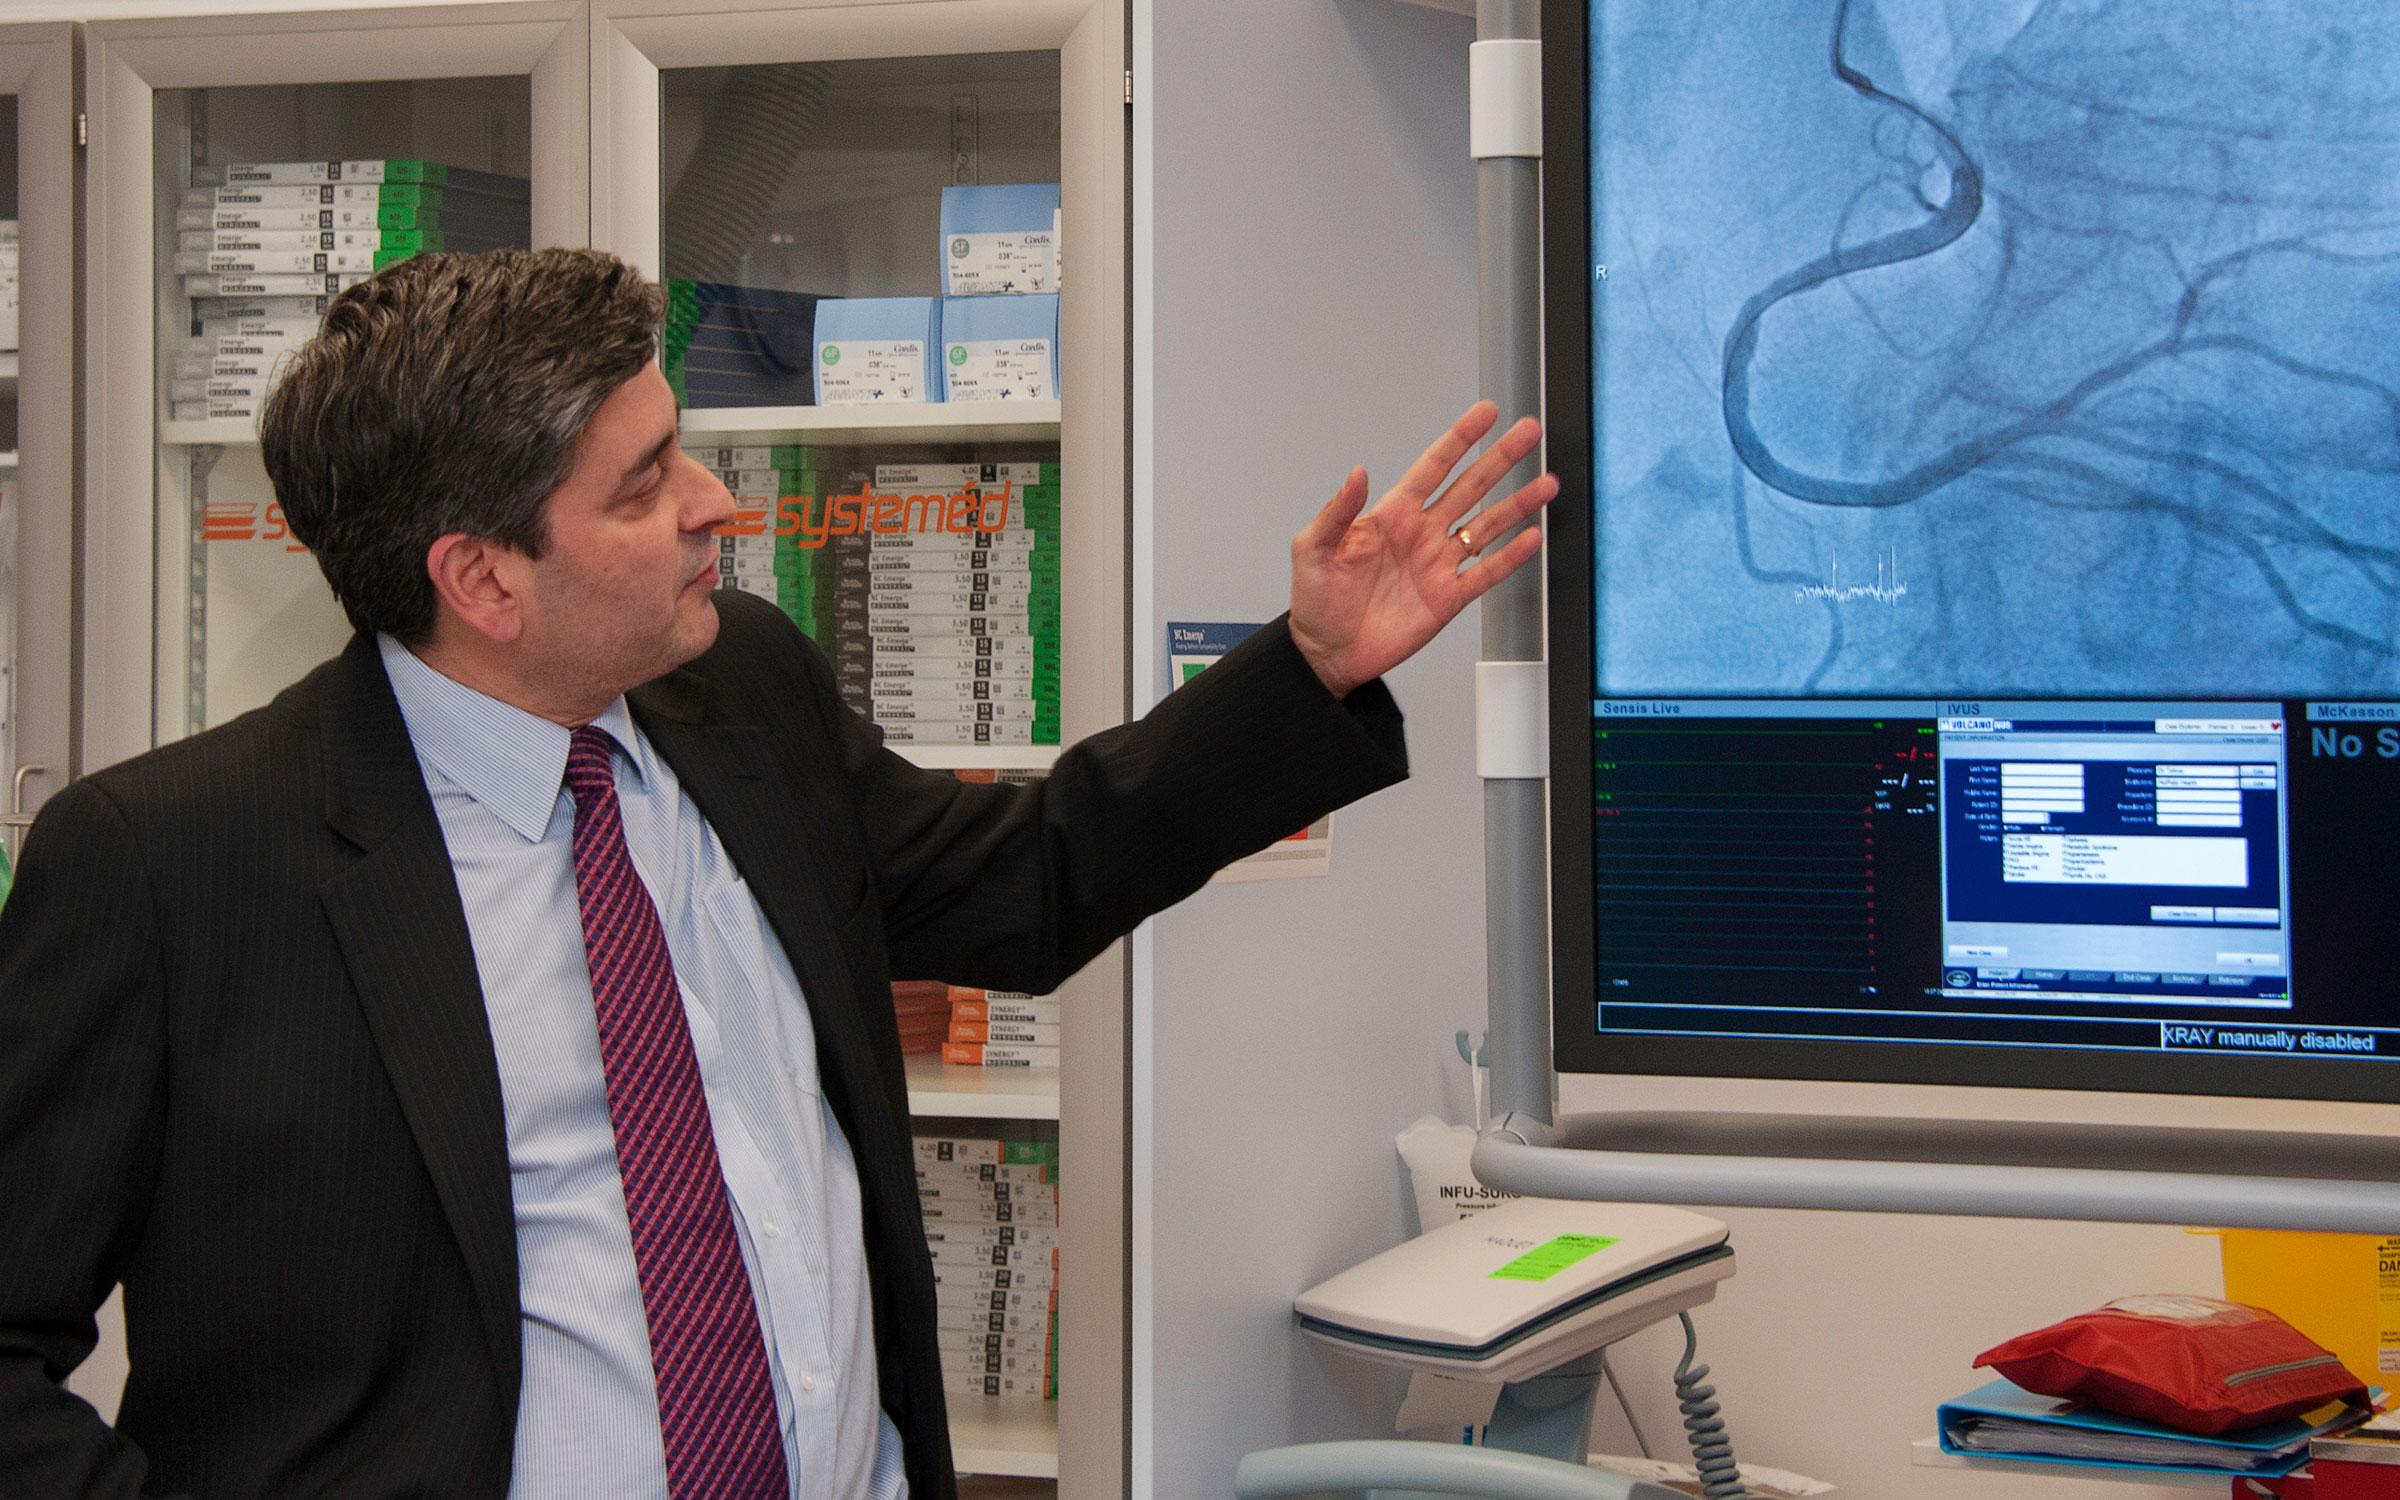 Dr Suneel Talwar, Cardiologist Bournemouth presentation